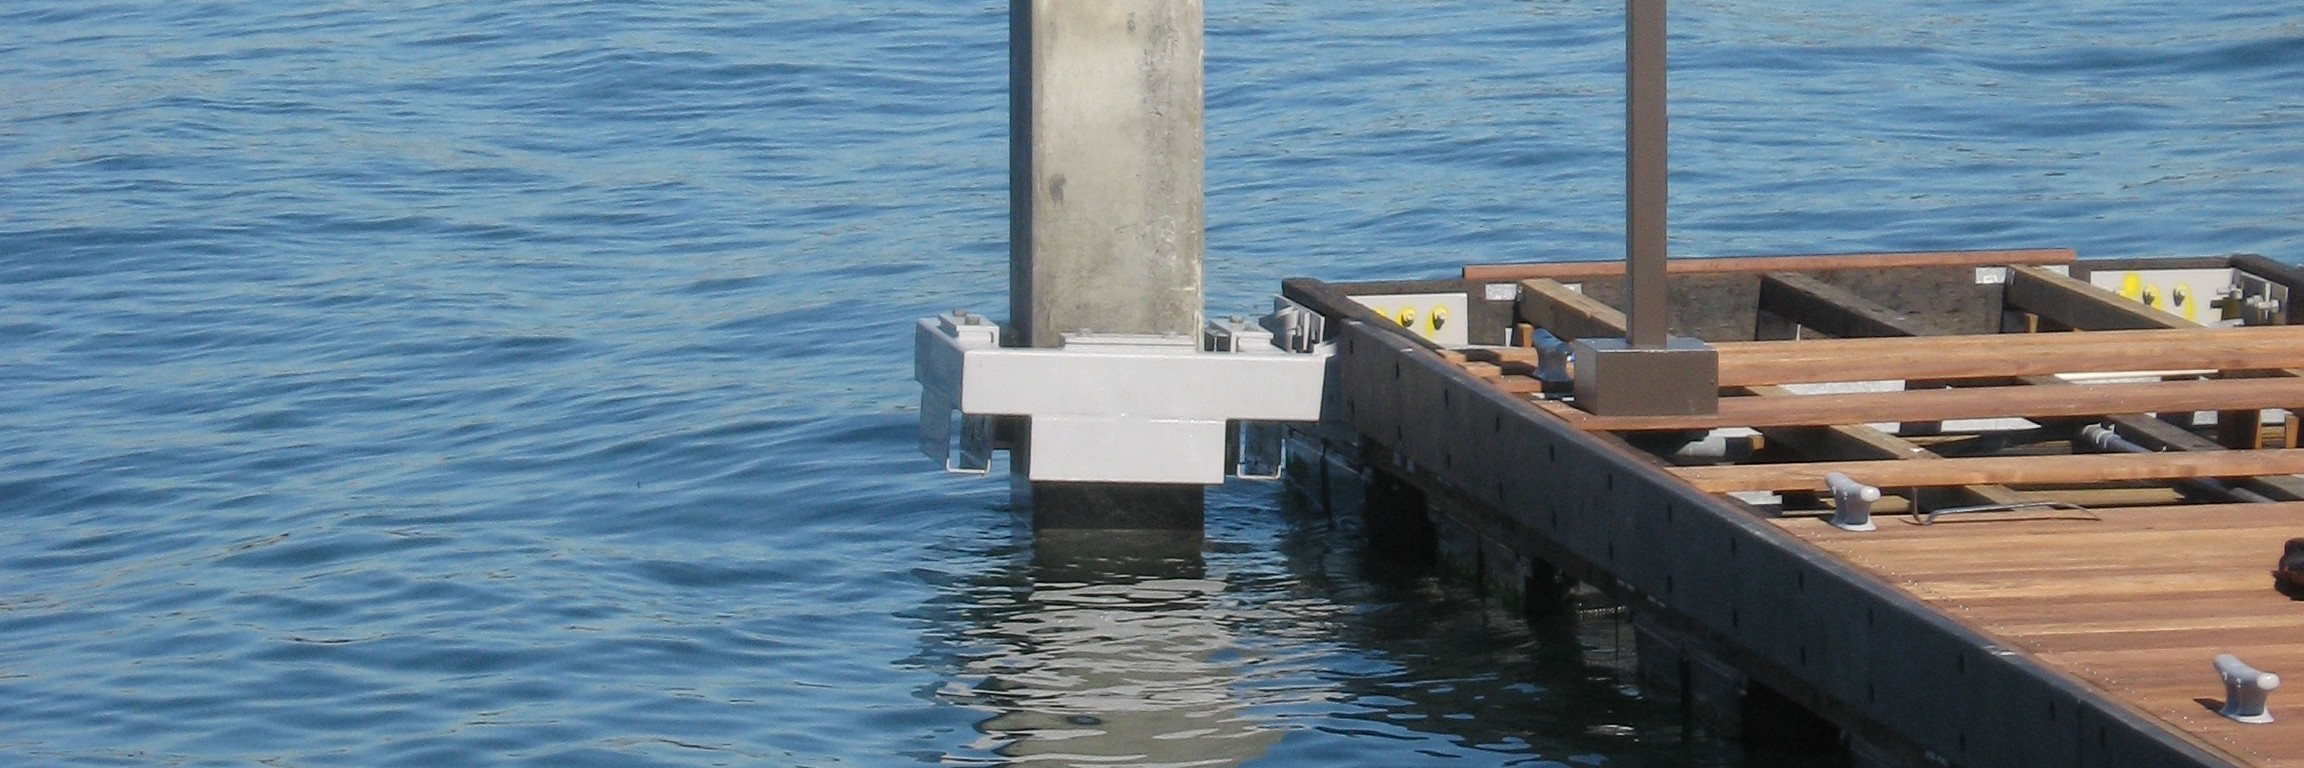 Pier 17 Floating Dock